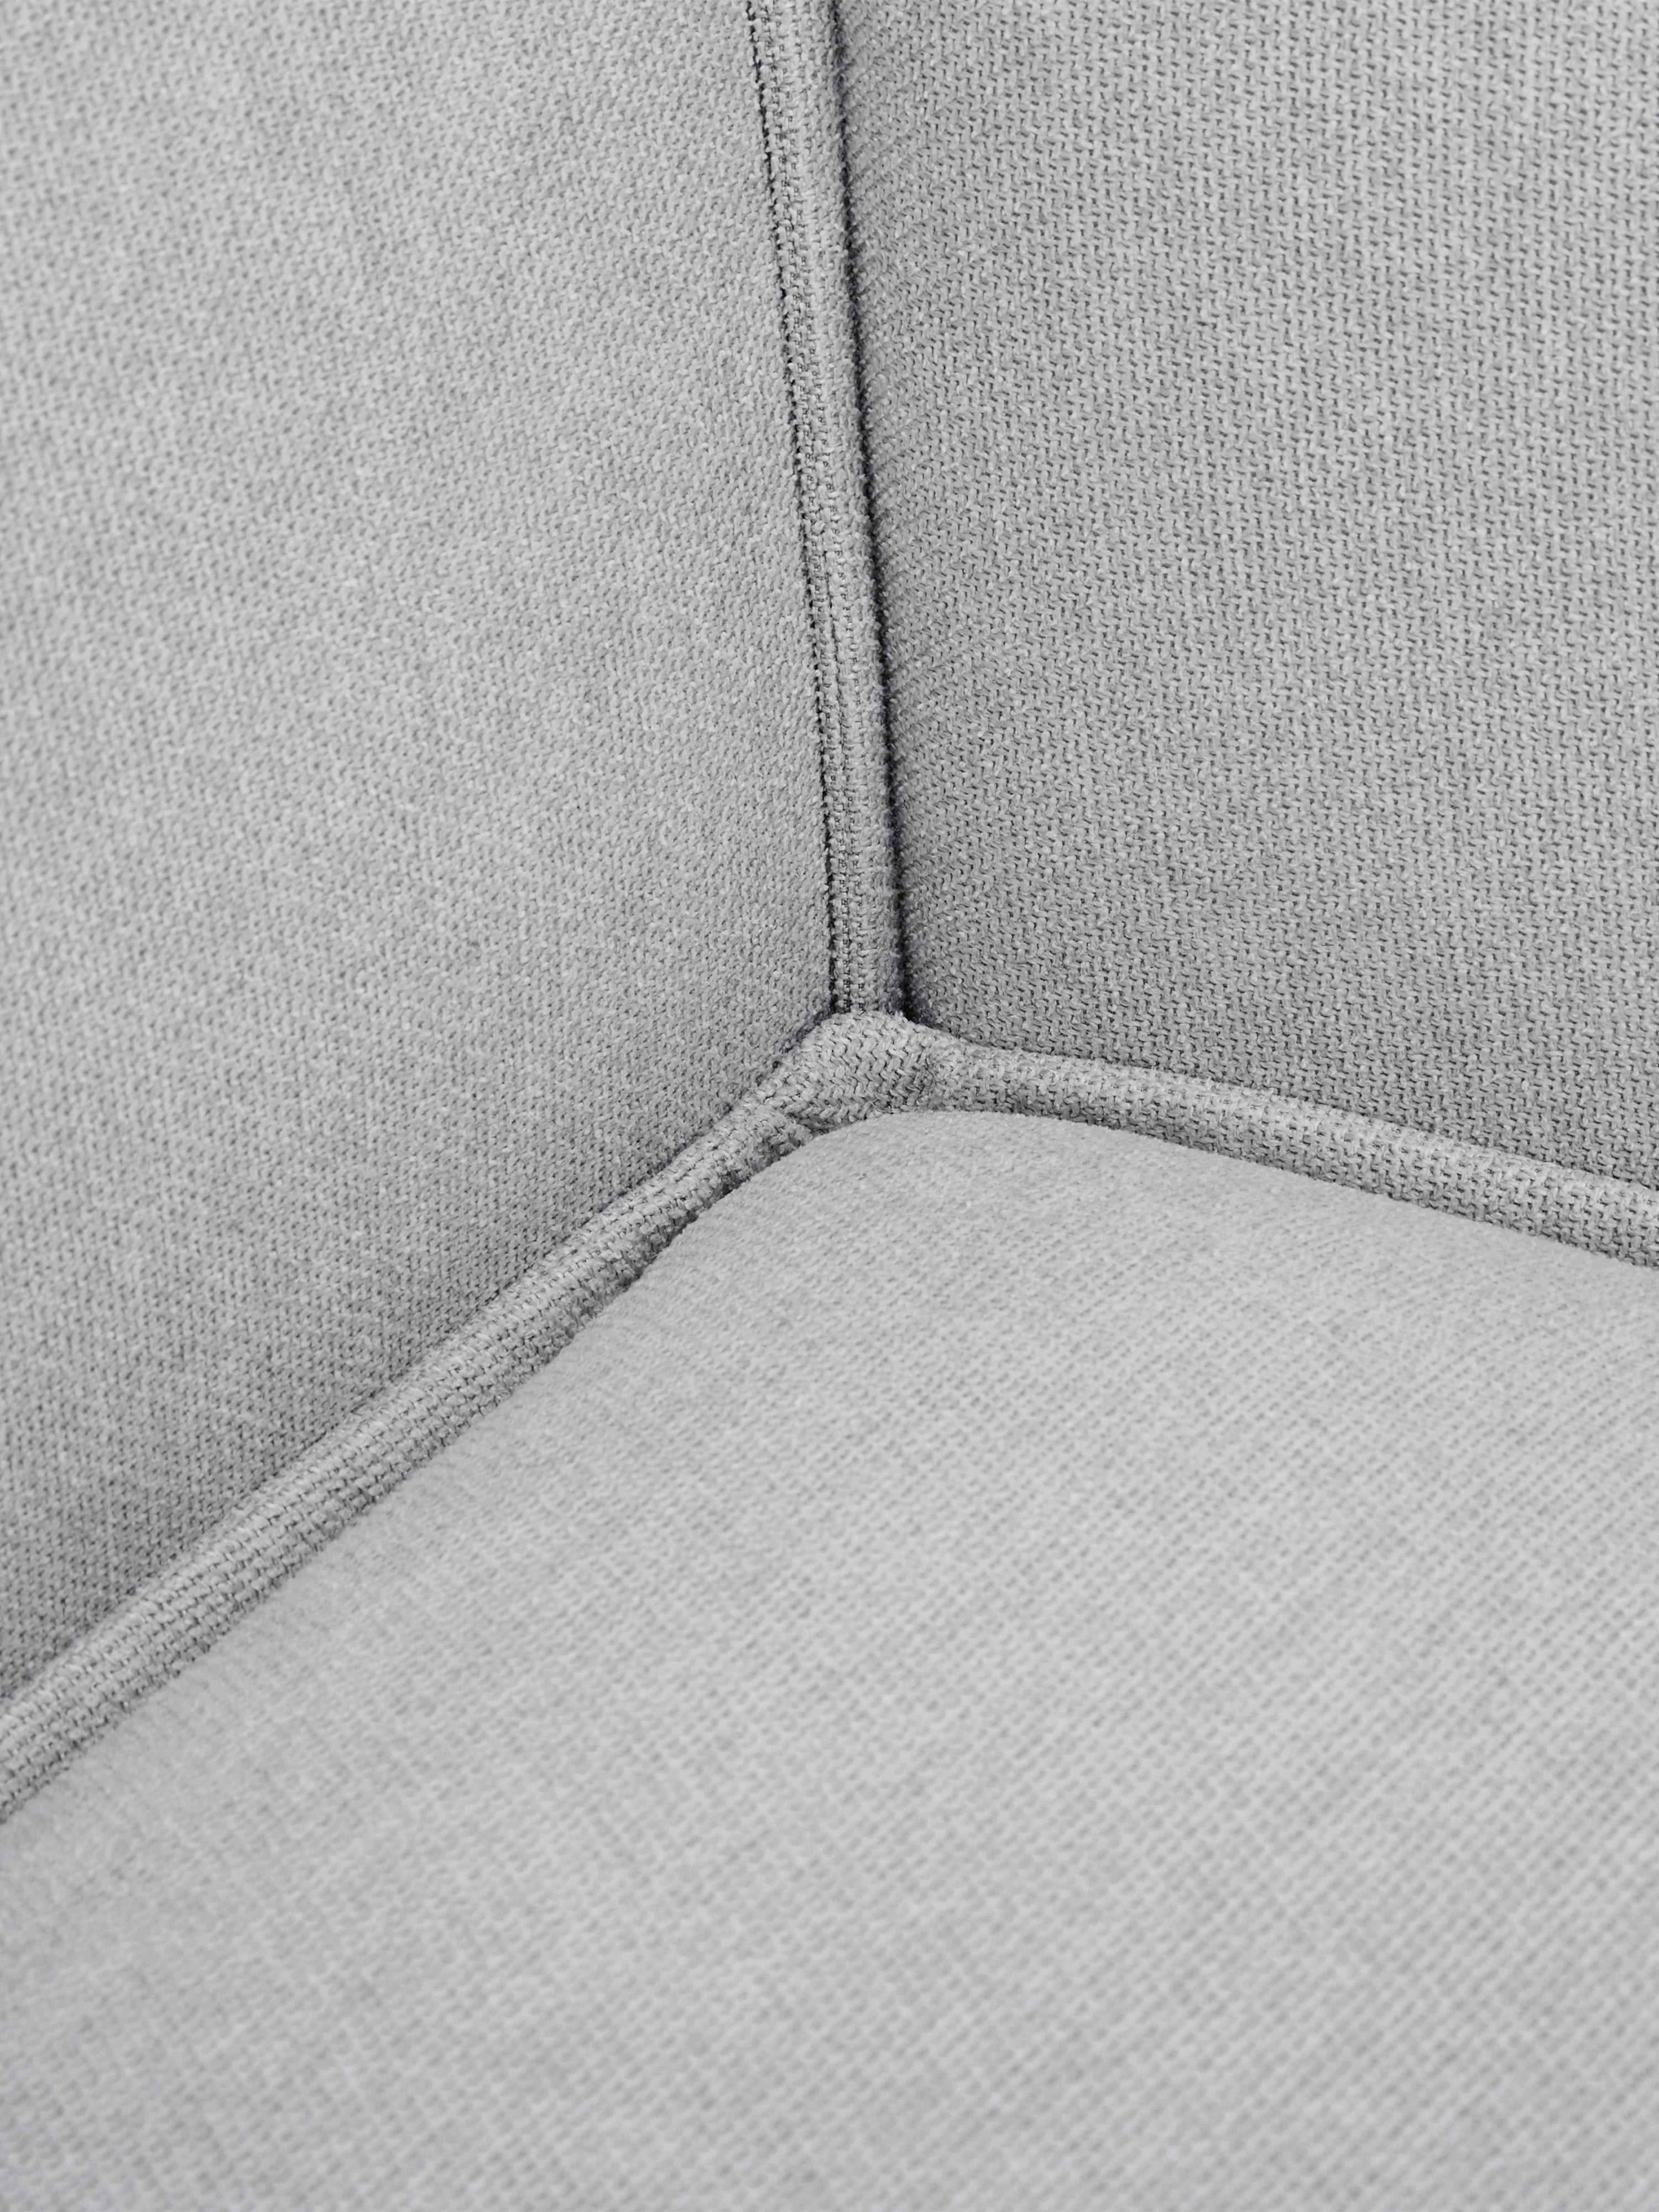 Modulares Sofa Lennon (3-Sitzer), Bezug: Polyester 35.000 Scheuert, Gestell: Massives Kiefernholz, Spe, Füße: Kunststoff, Webstoff Hellgrau, B 238 x T 119 cm